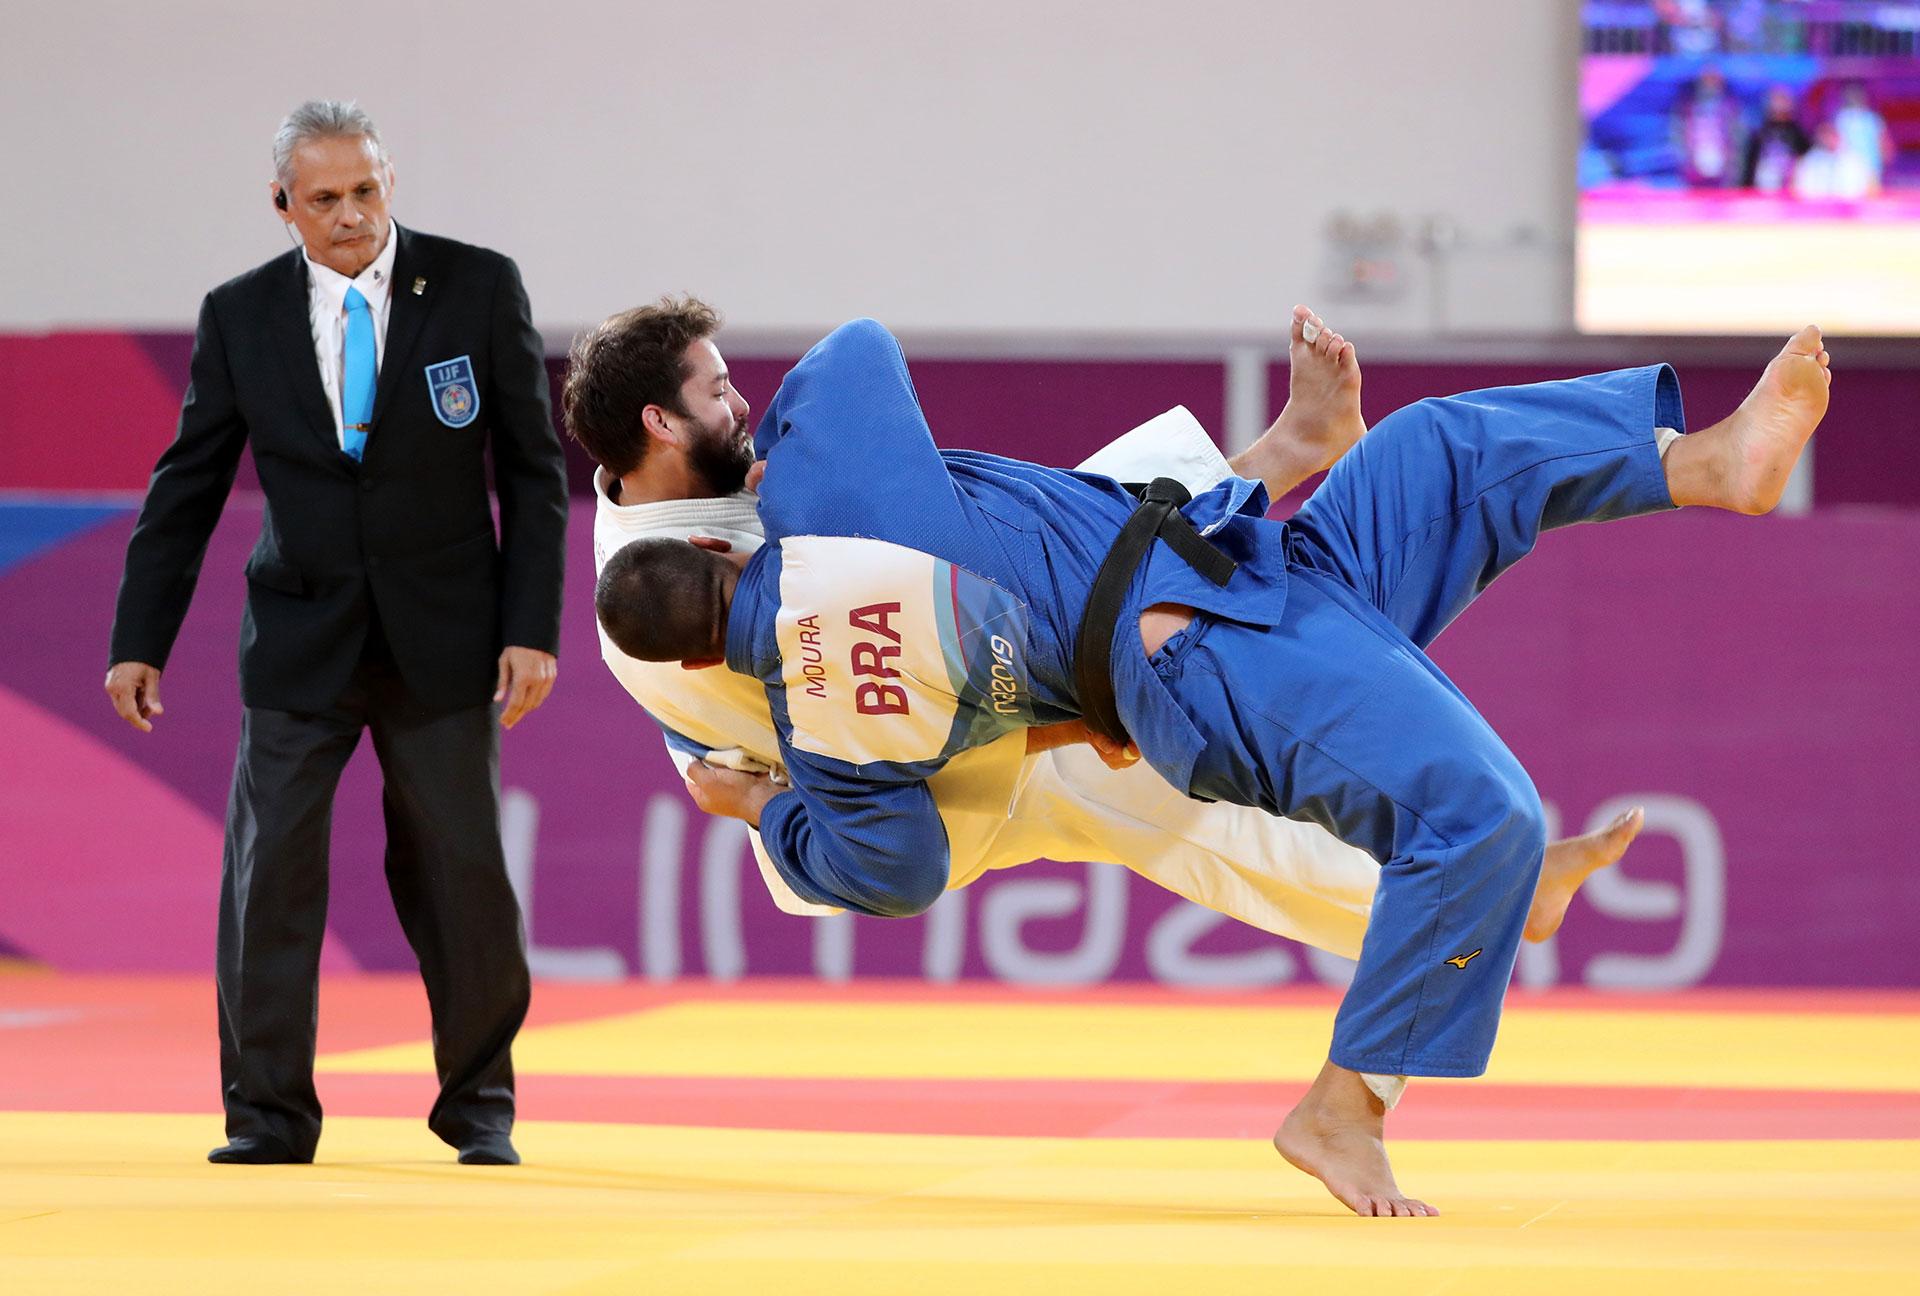 XVIII Pan American Games - Lima 2019 - Judo - Men's +100 kg Bronze Medal Match - Villa Deportiva Nacional, Videna, Lima, Peru - August 11, 2019 Ajax Tadehara of the U.S. and Brazil's David Moura in action. REUTERS/Sergio Moraes